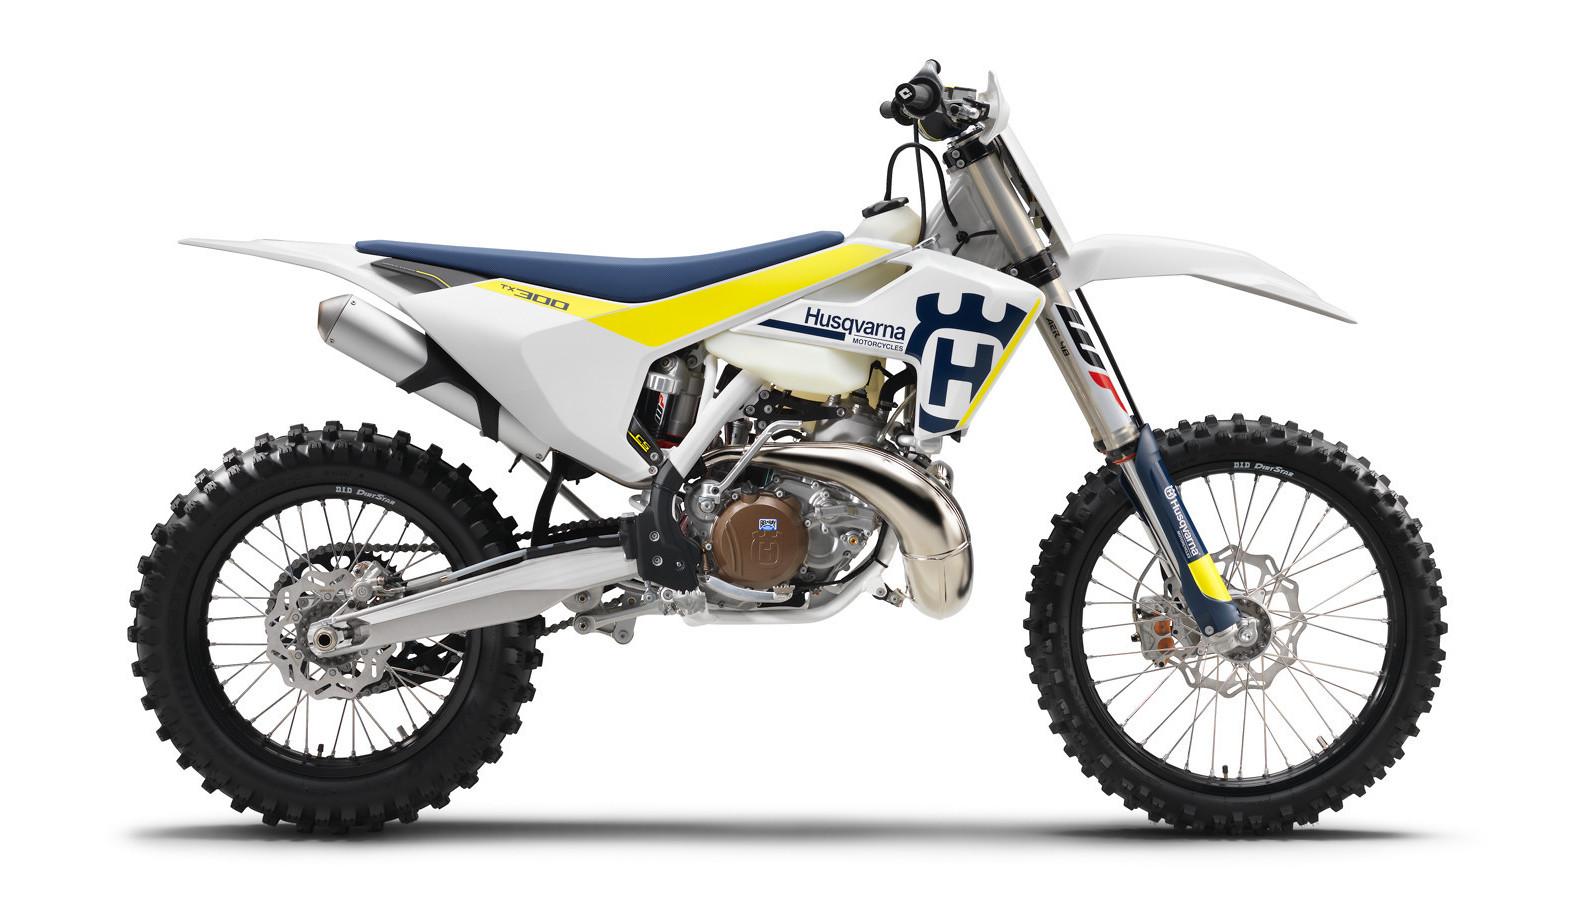 2017 Husqvarna TX 300